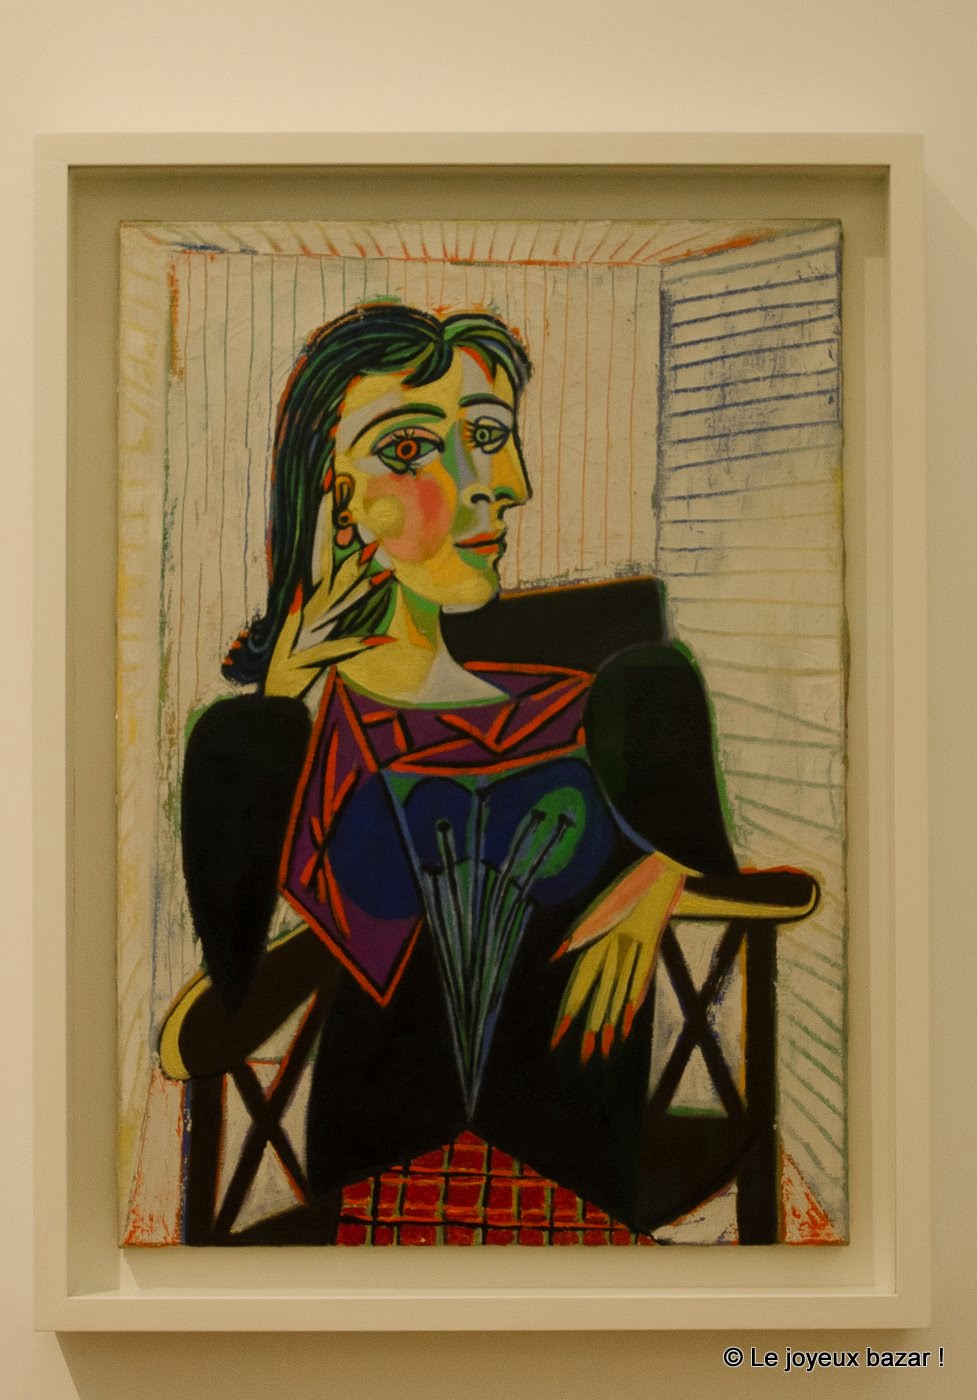 Musee Picasso - Paris - Dora Mar